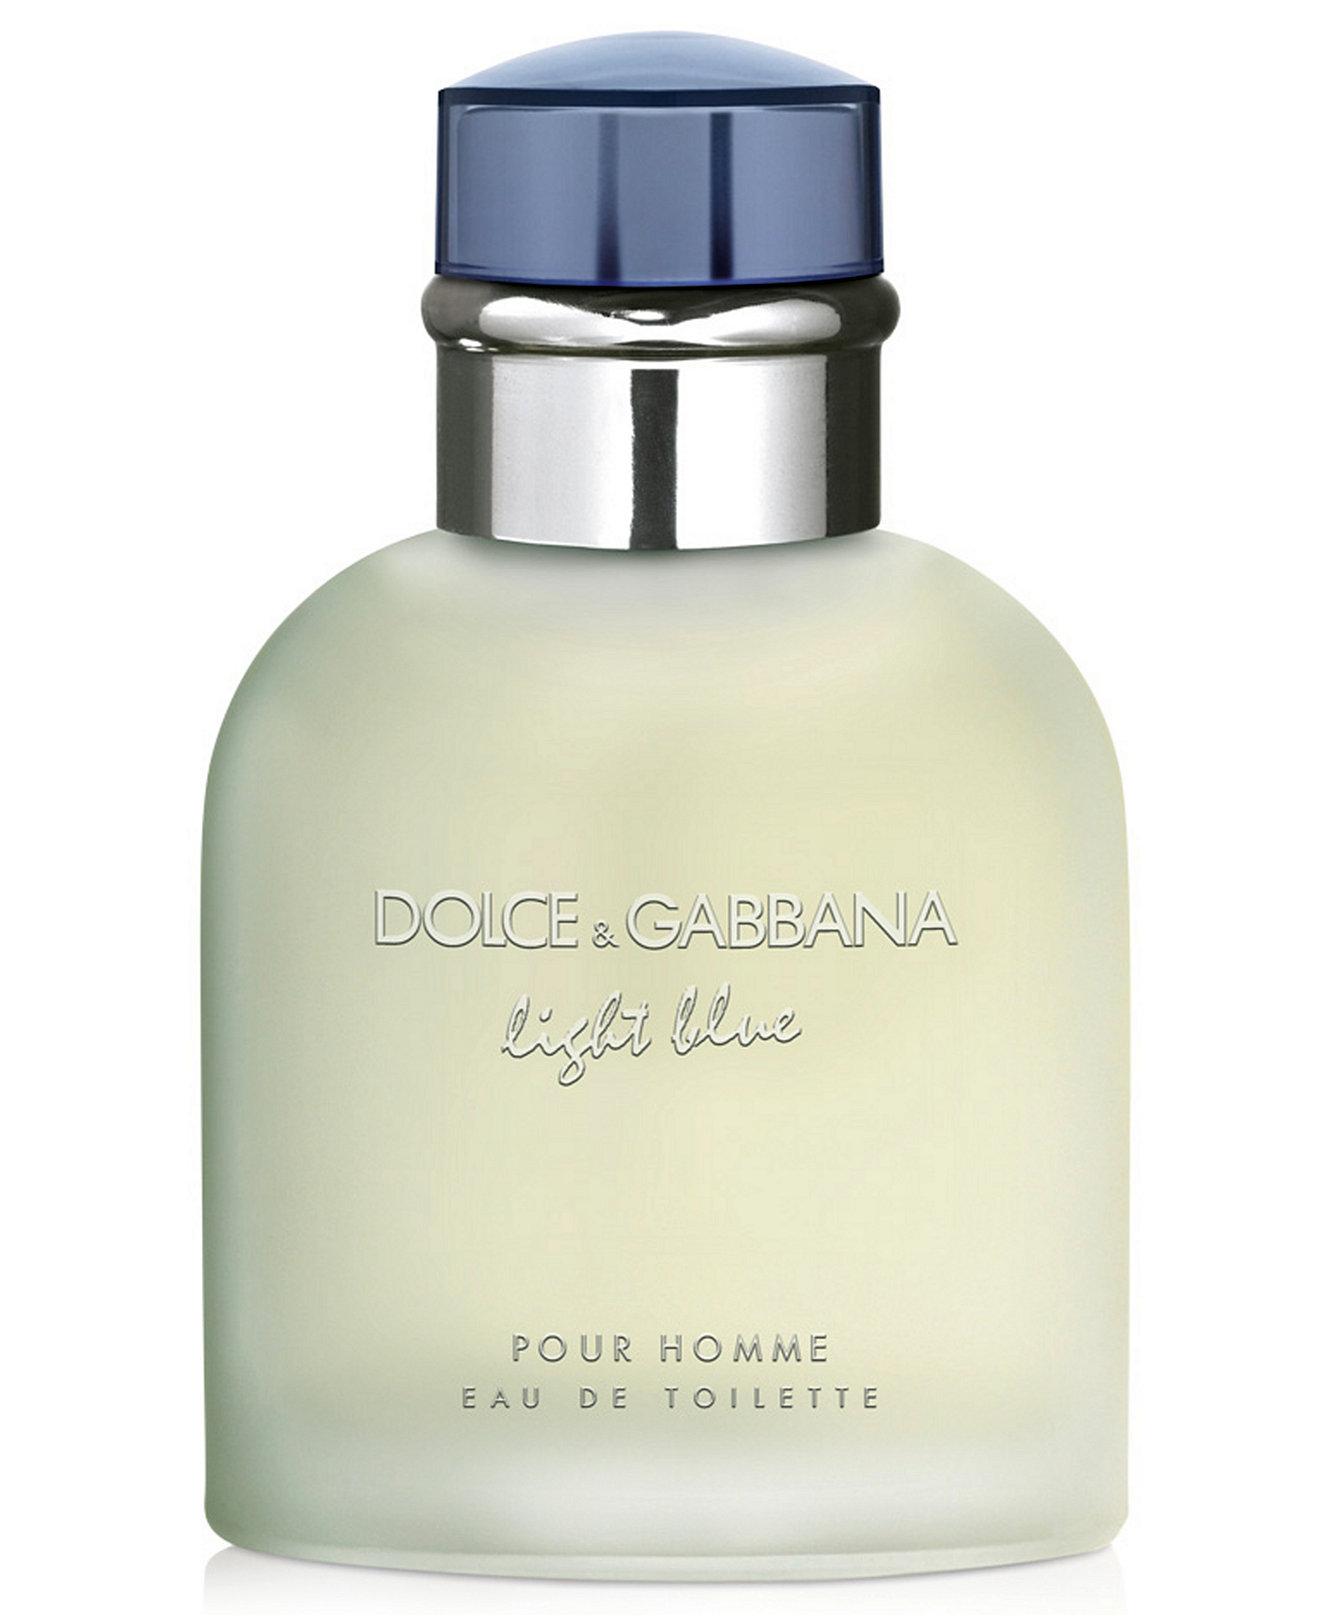 2ac64d4b4e19 Αρωμα τύπου Light Blue – Dolce   Gabbana – La Finezza – Αρωματοπωλείο